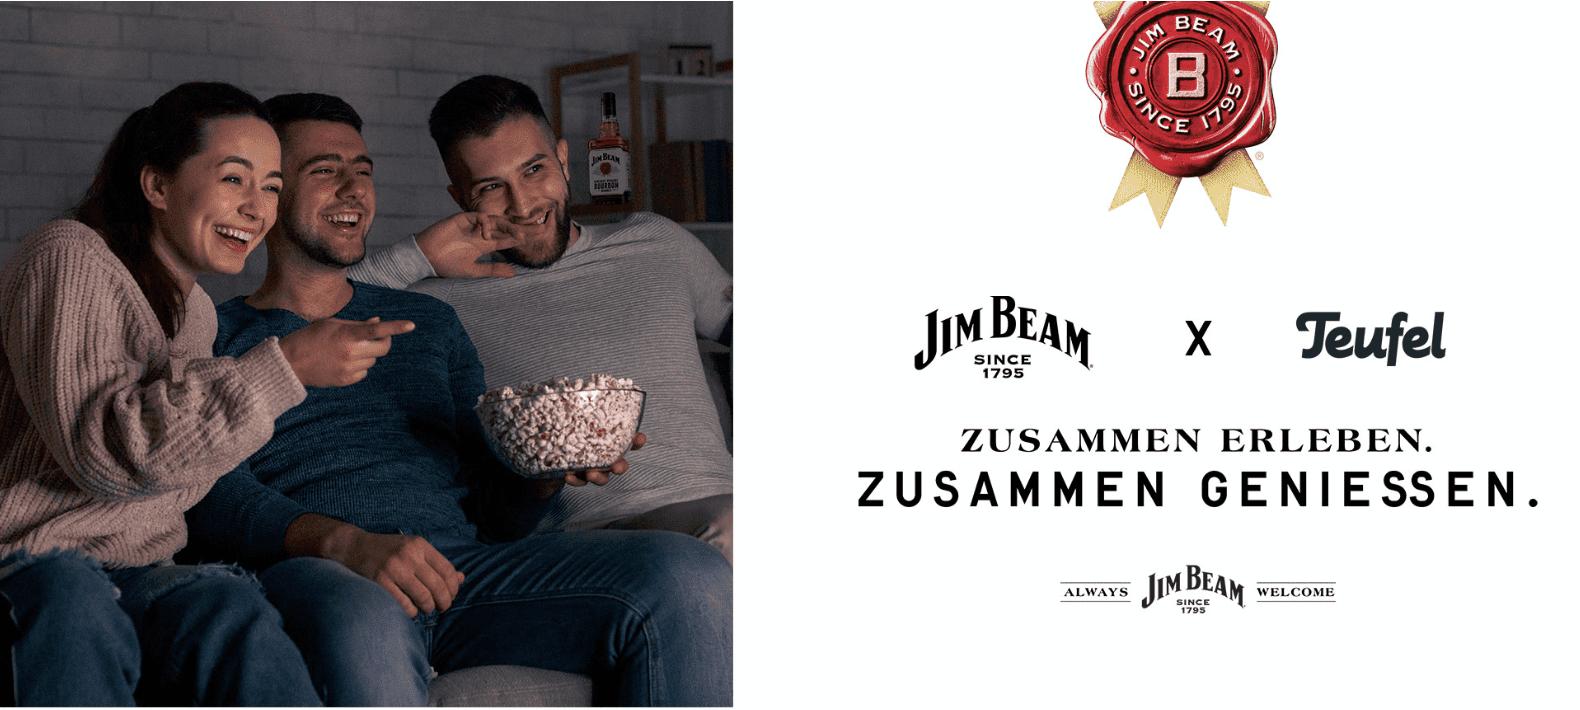 Gewinnspiel-Cases FMCG Getränke Jim Beam